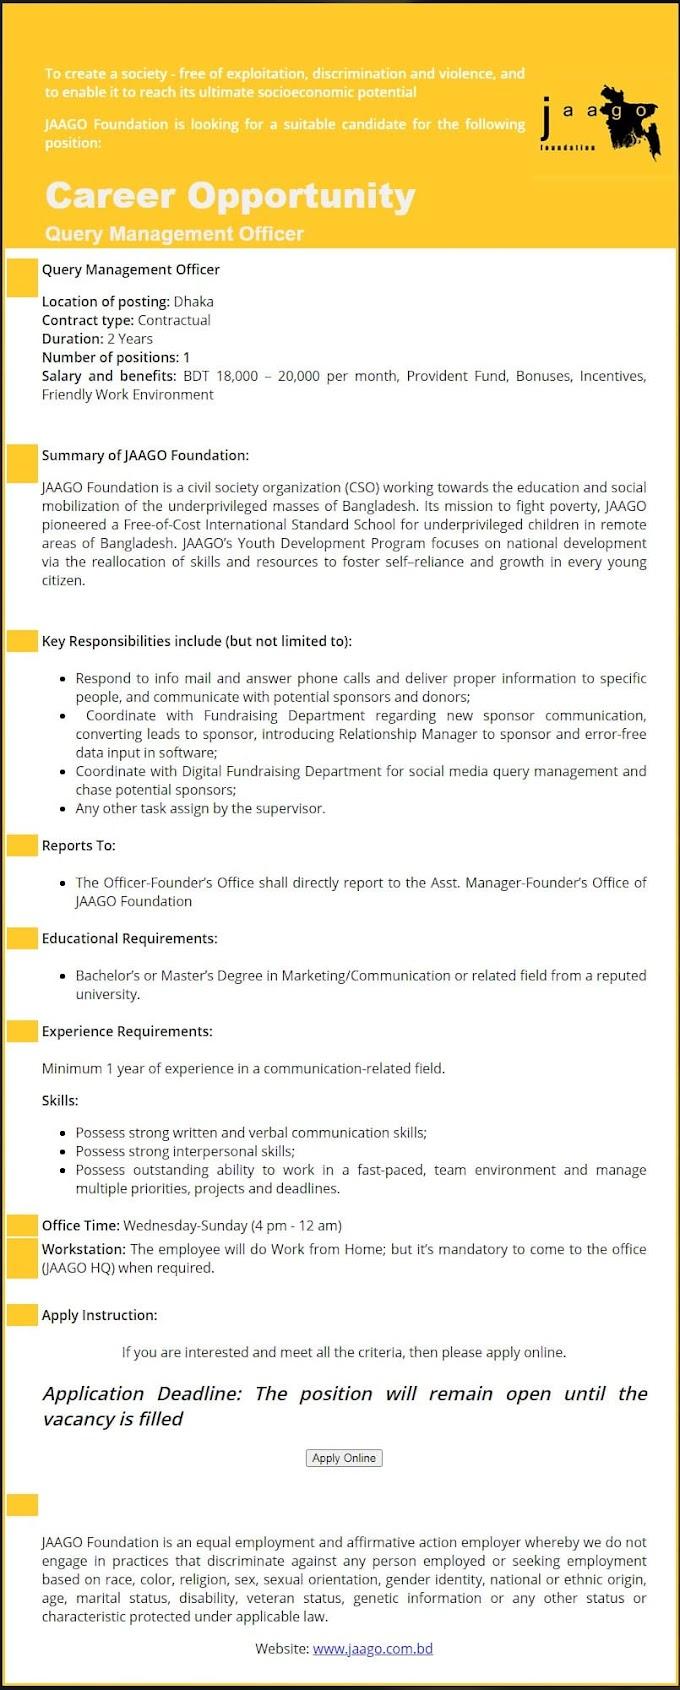 JAAGO Foundation Job Circular 2021